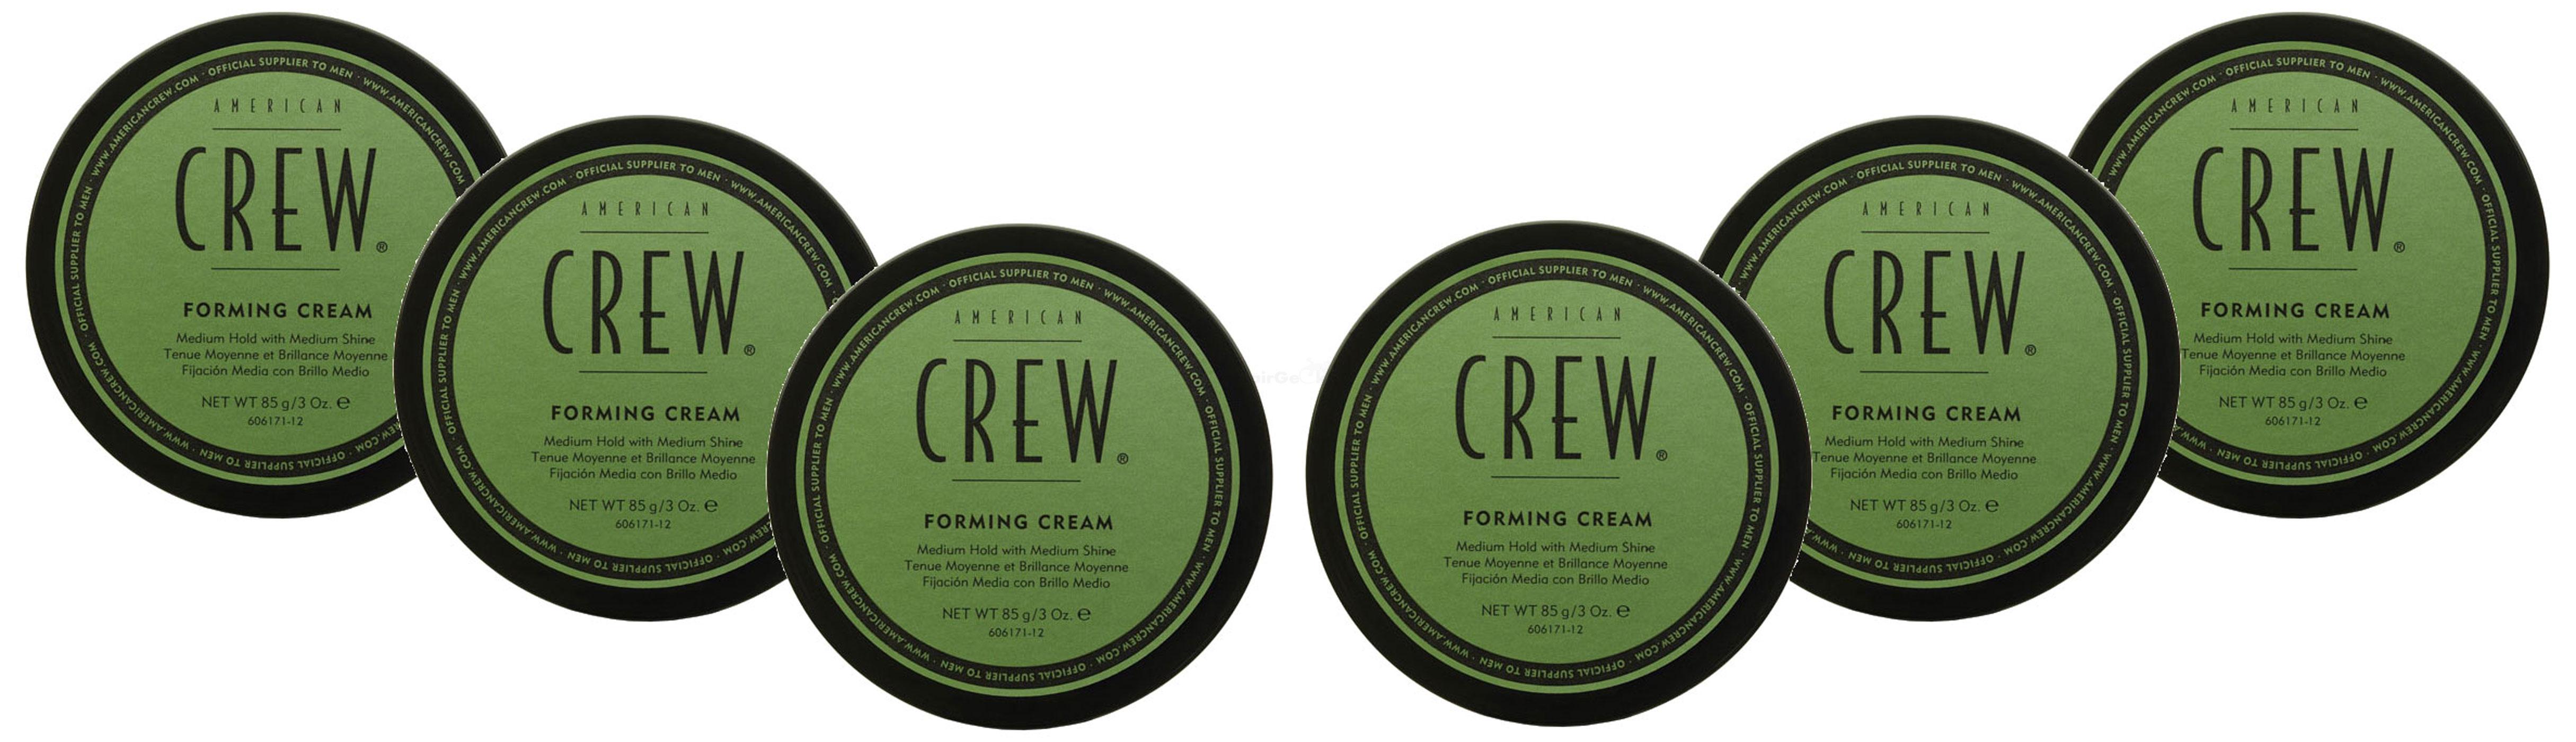 American Crew Forming Cream Aktion - 6x 85g = 510g